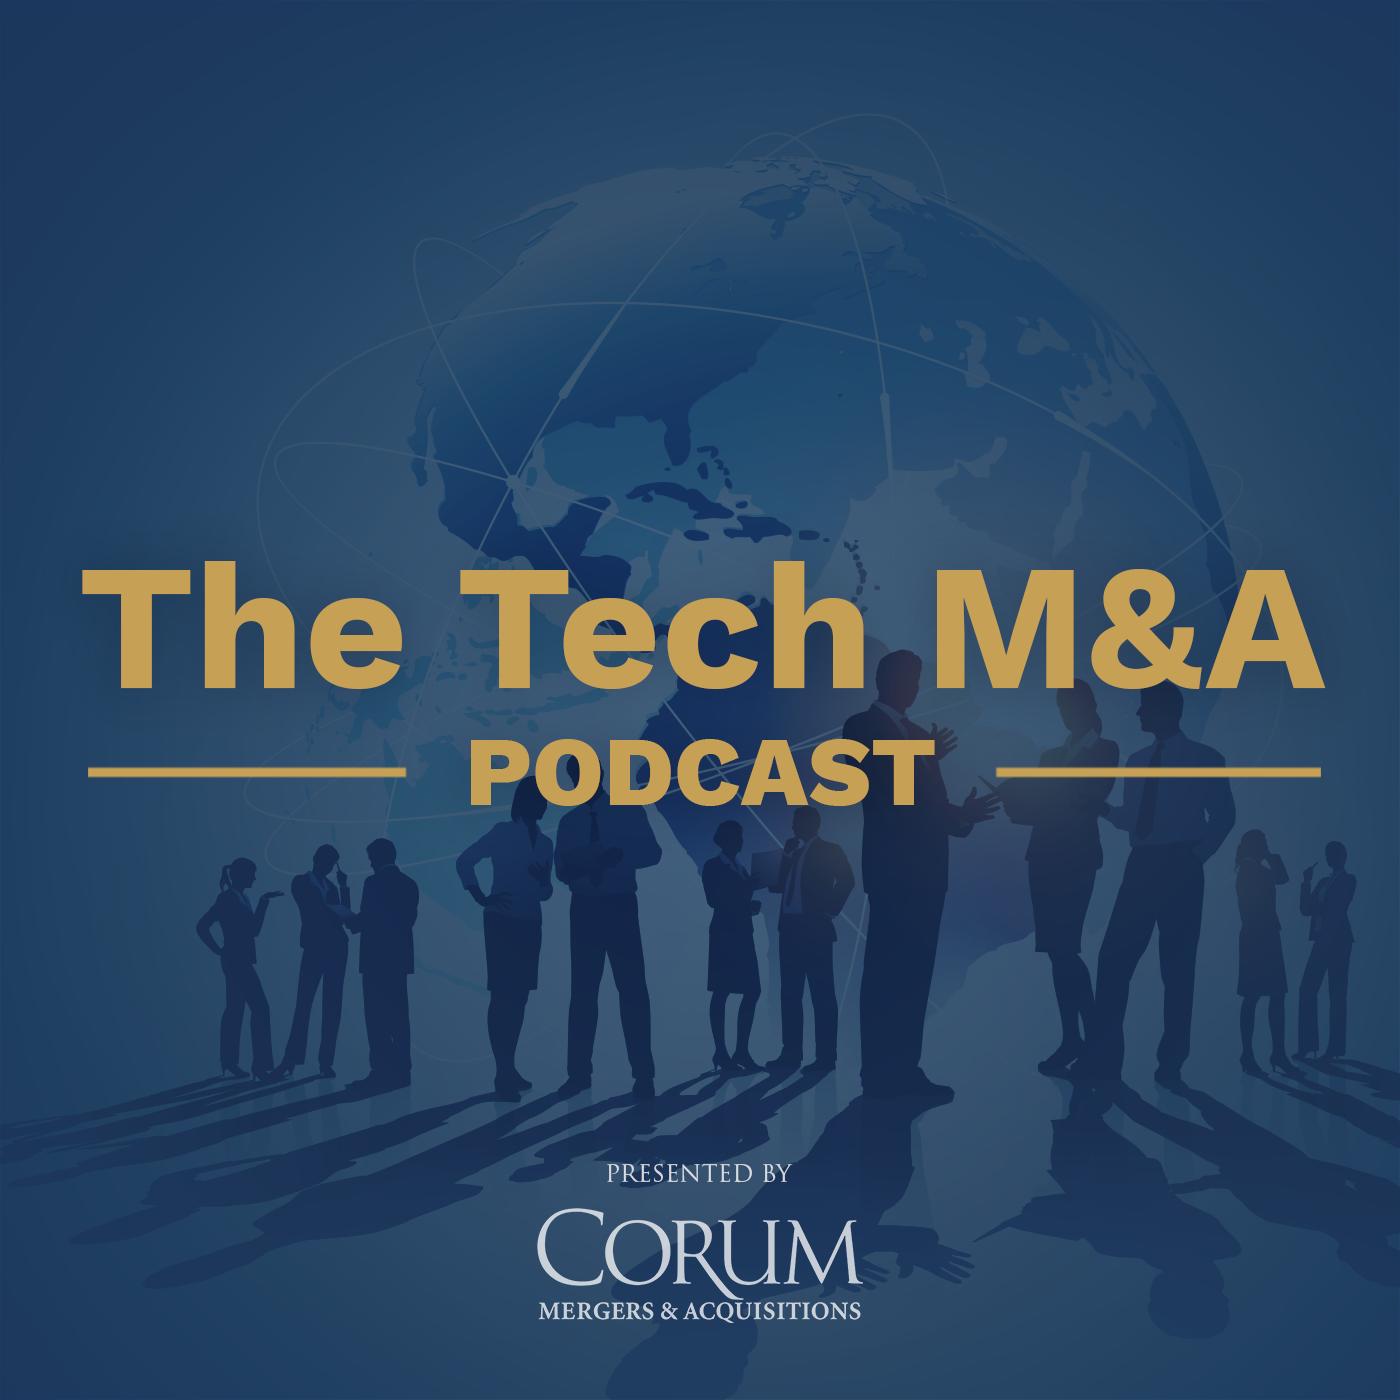 The Tech M&A Podcast show art